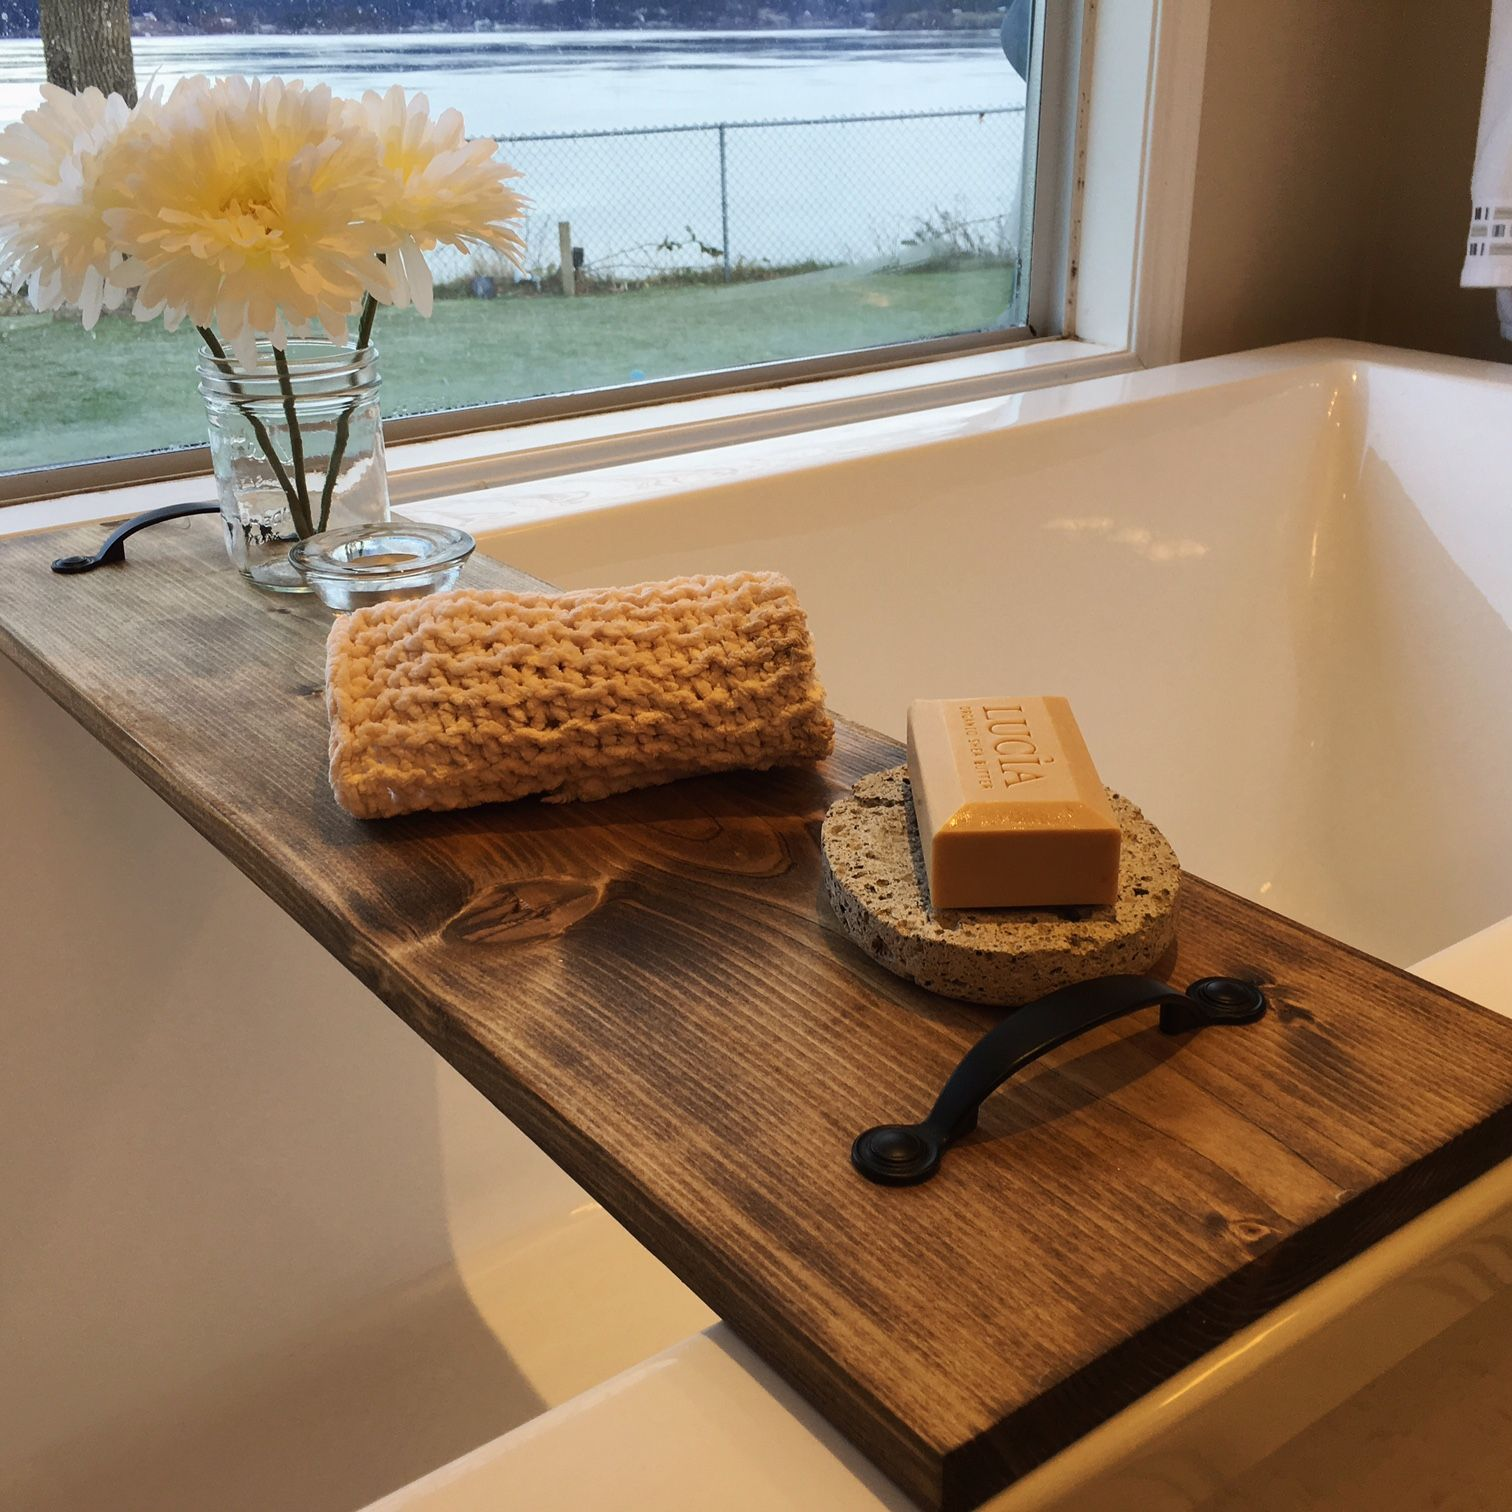 Rustic bath tub tray | Luxe Lumber Company | Pinterest | Bath tubs ...